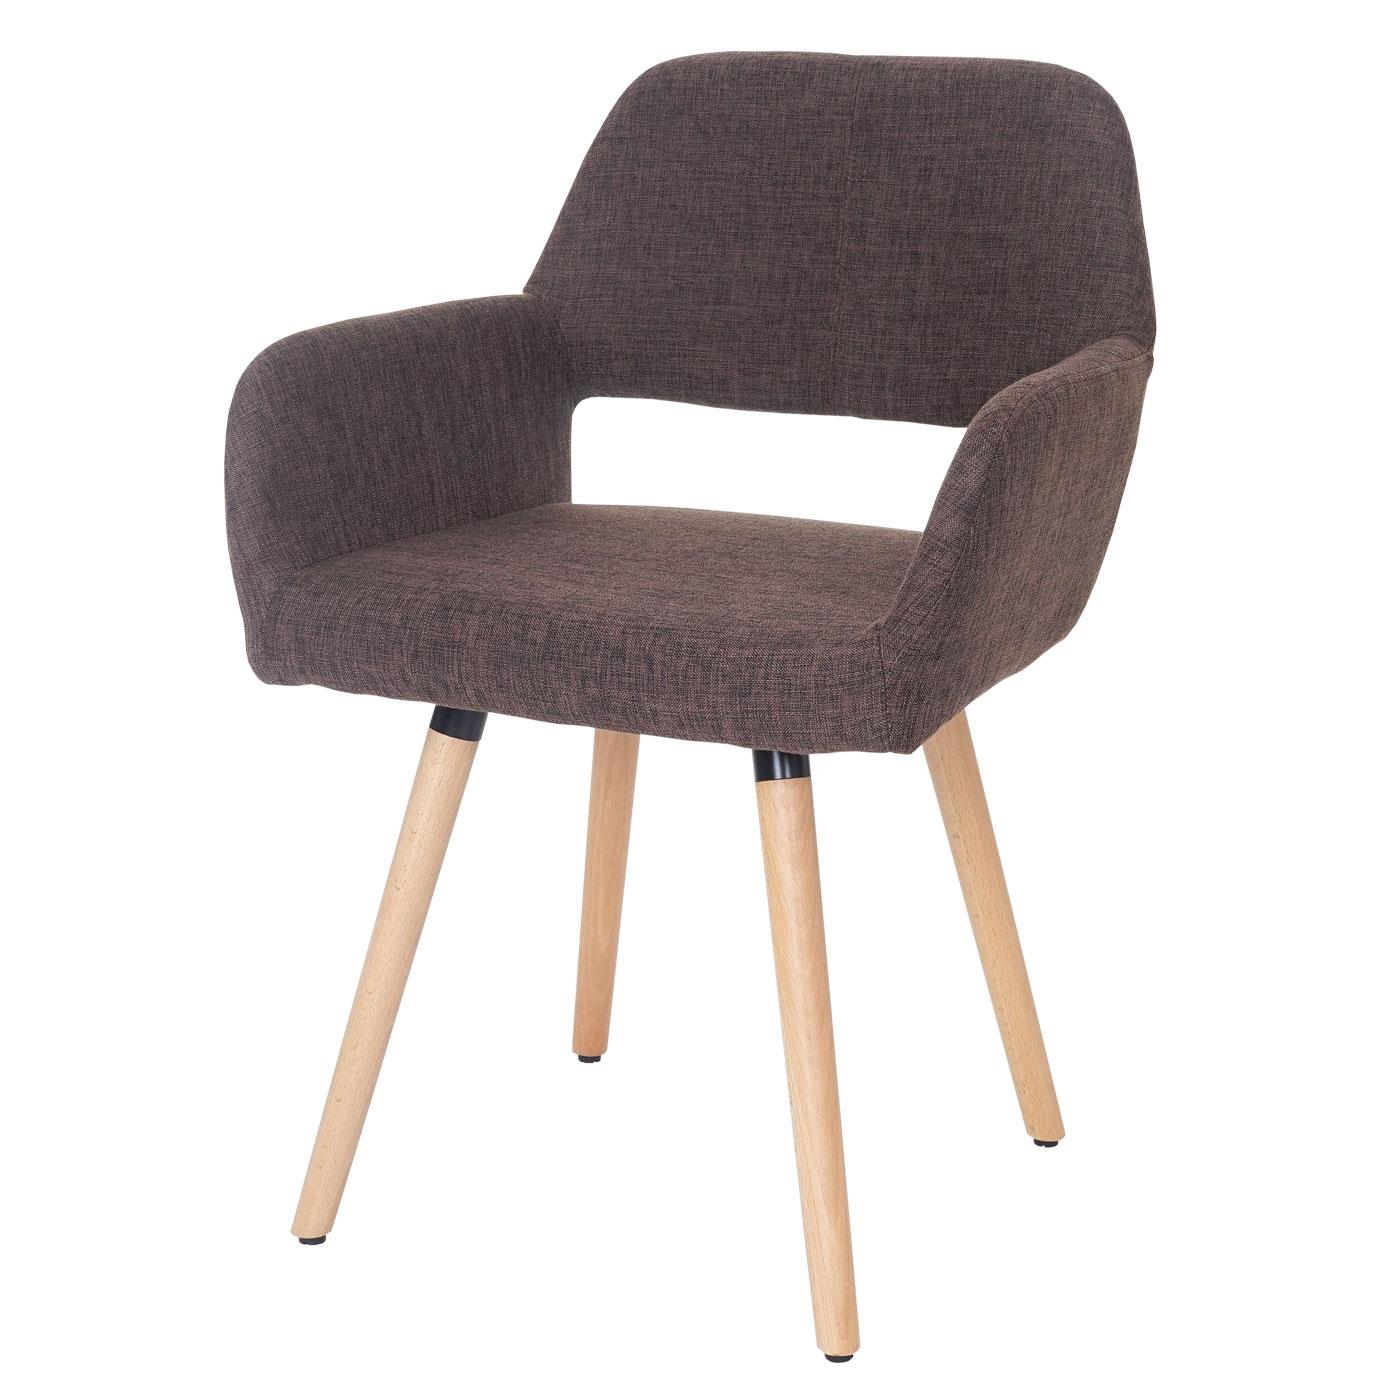 esszimmerstuhl dohna ii retro design textil braun. Black Bedroom Furniture Sets. Home Design Ideas